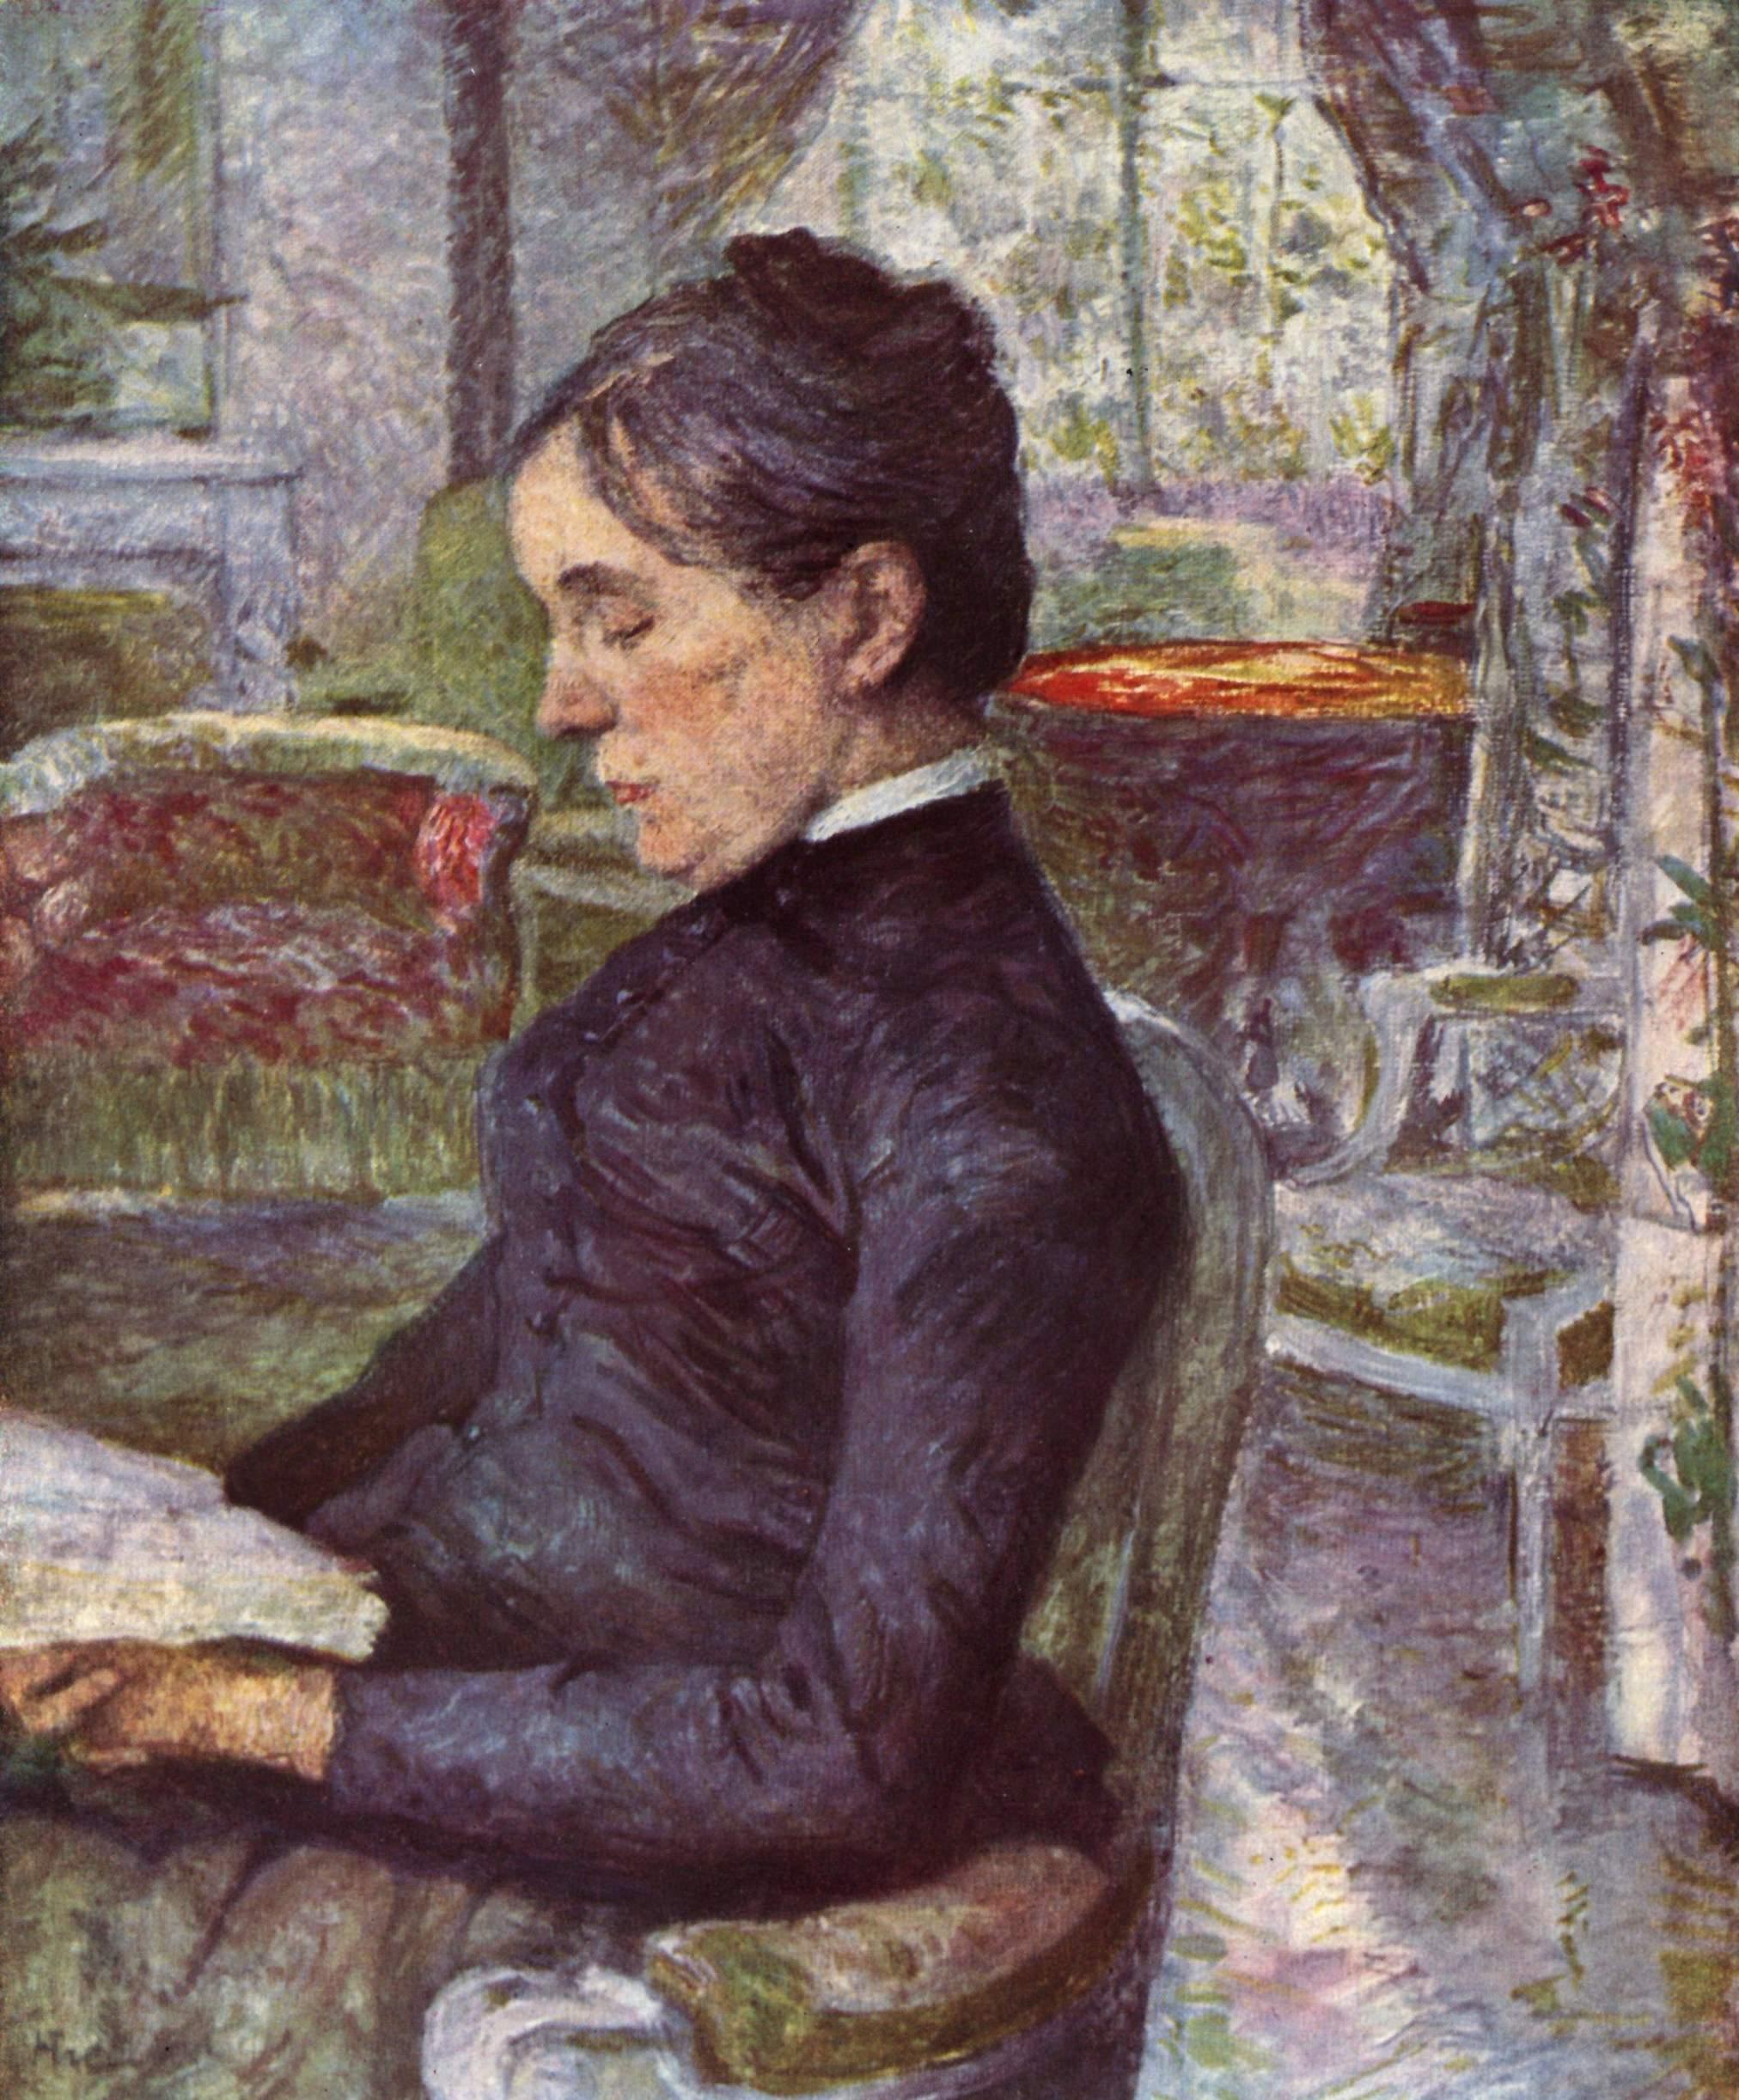 Toulouse Lautrec Paintings For Sale